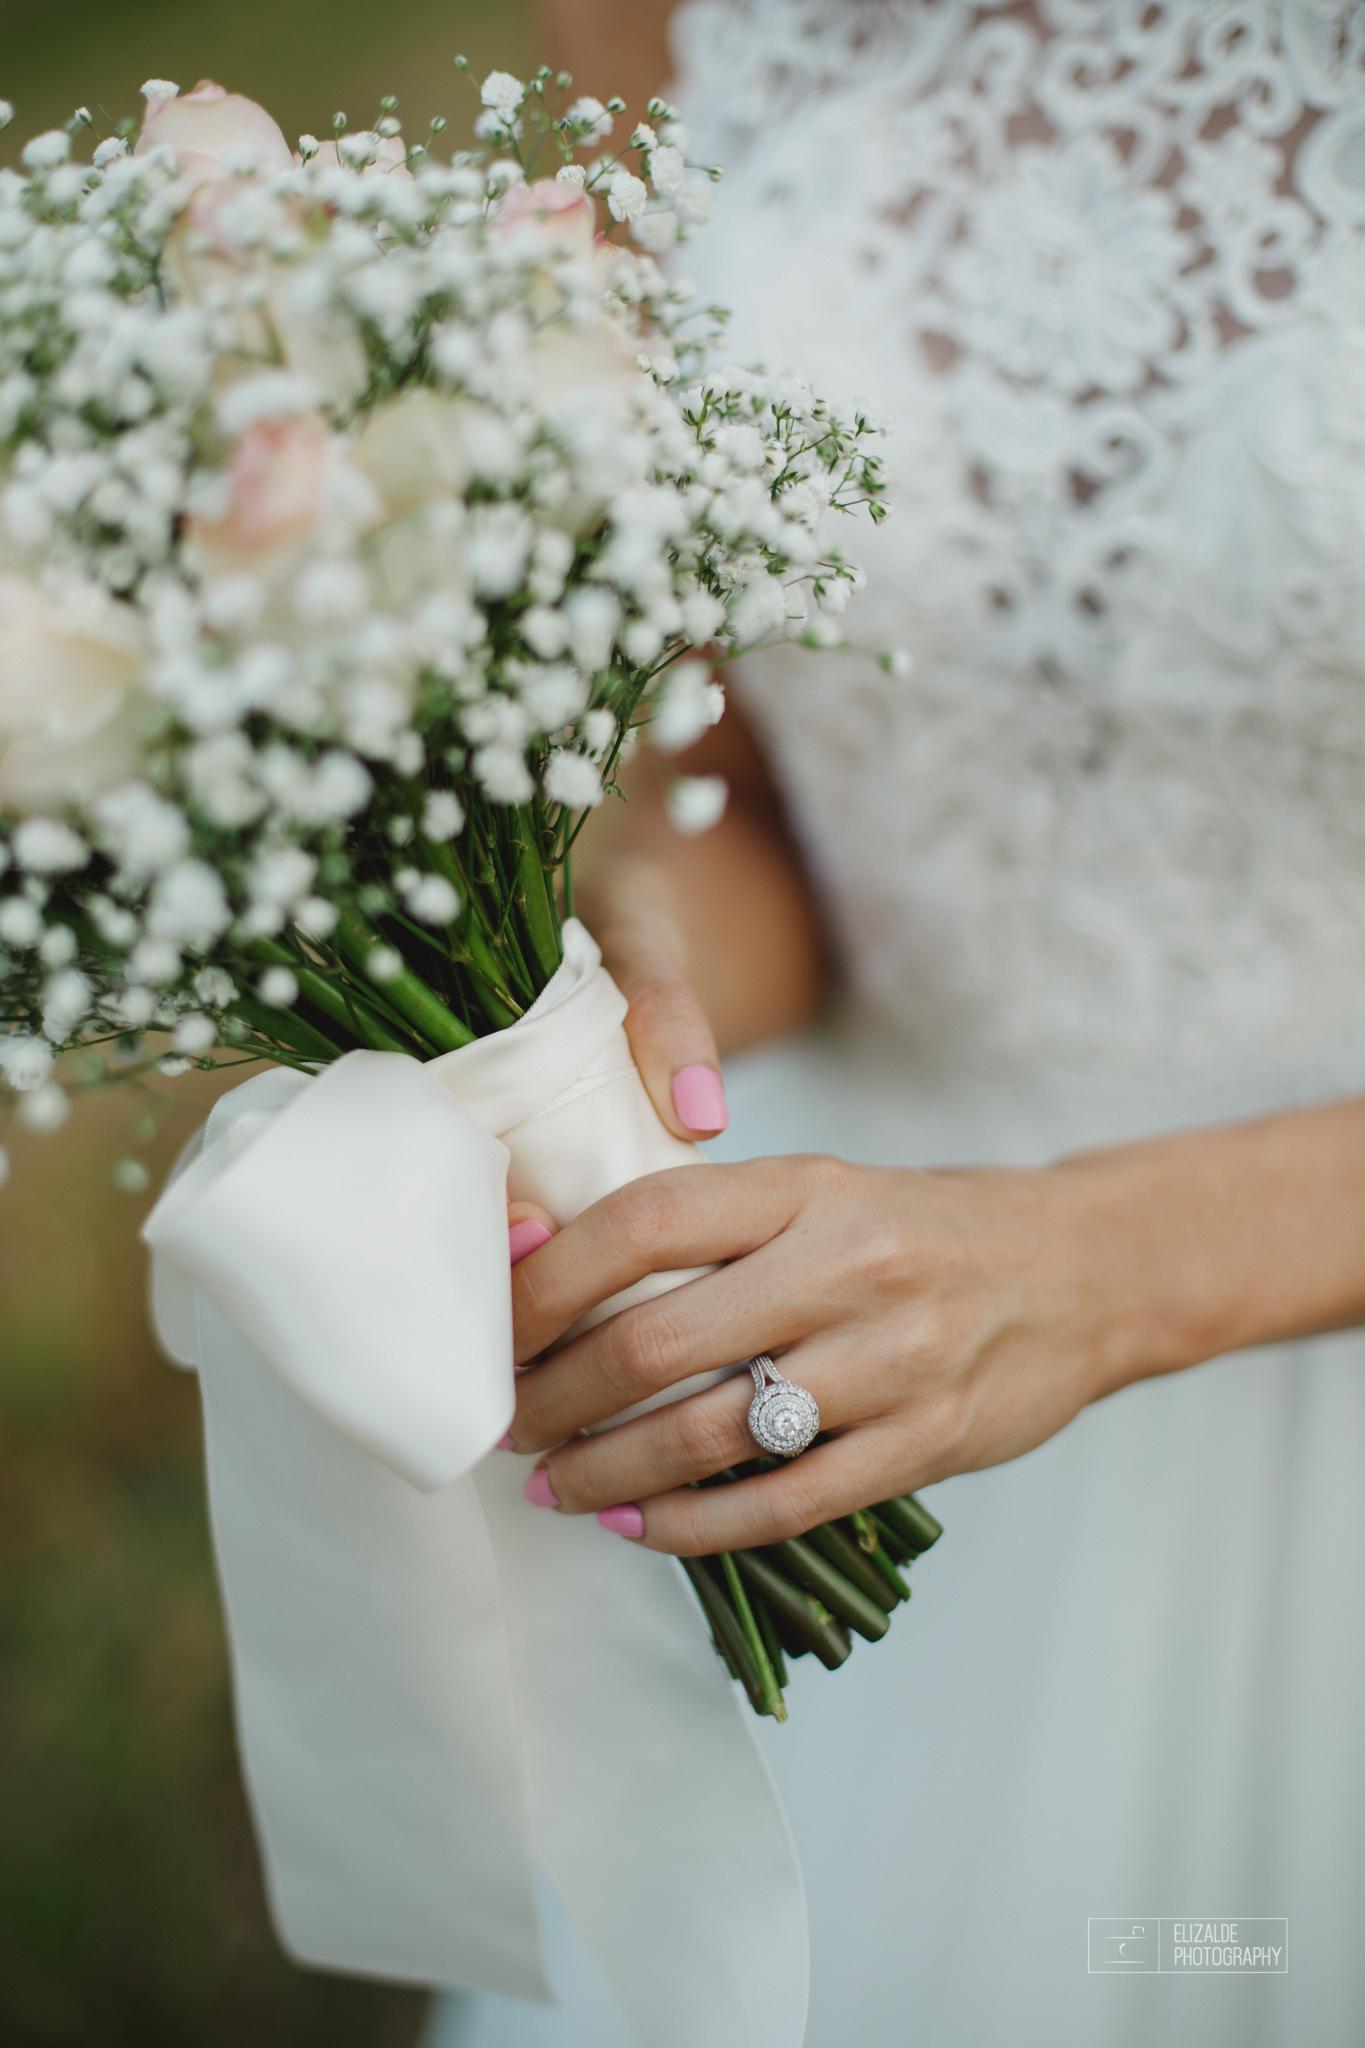 Bridal session_Dallas Photographer_Elizalde Photography_Denton photographer_ DFW Photographer_ Wedding Photographer_Baleigh18.jpg